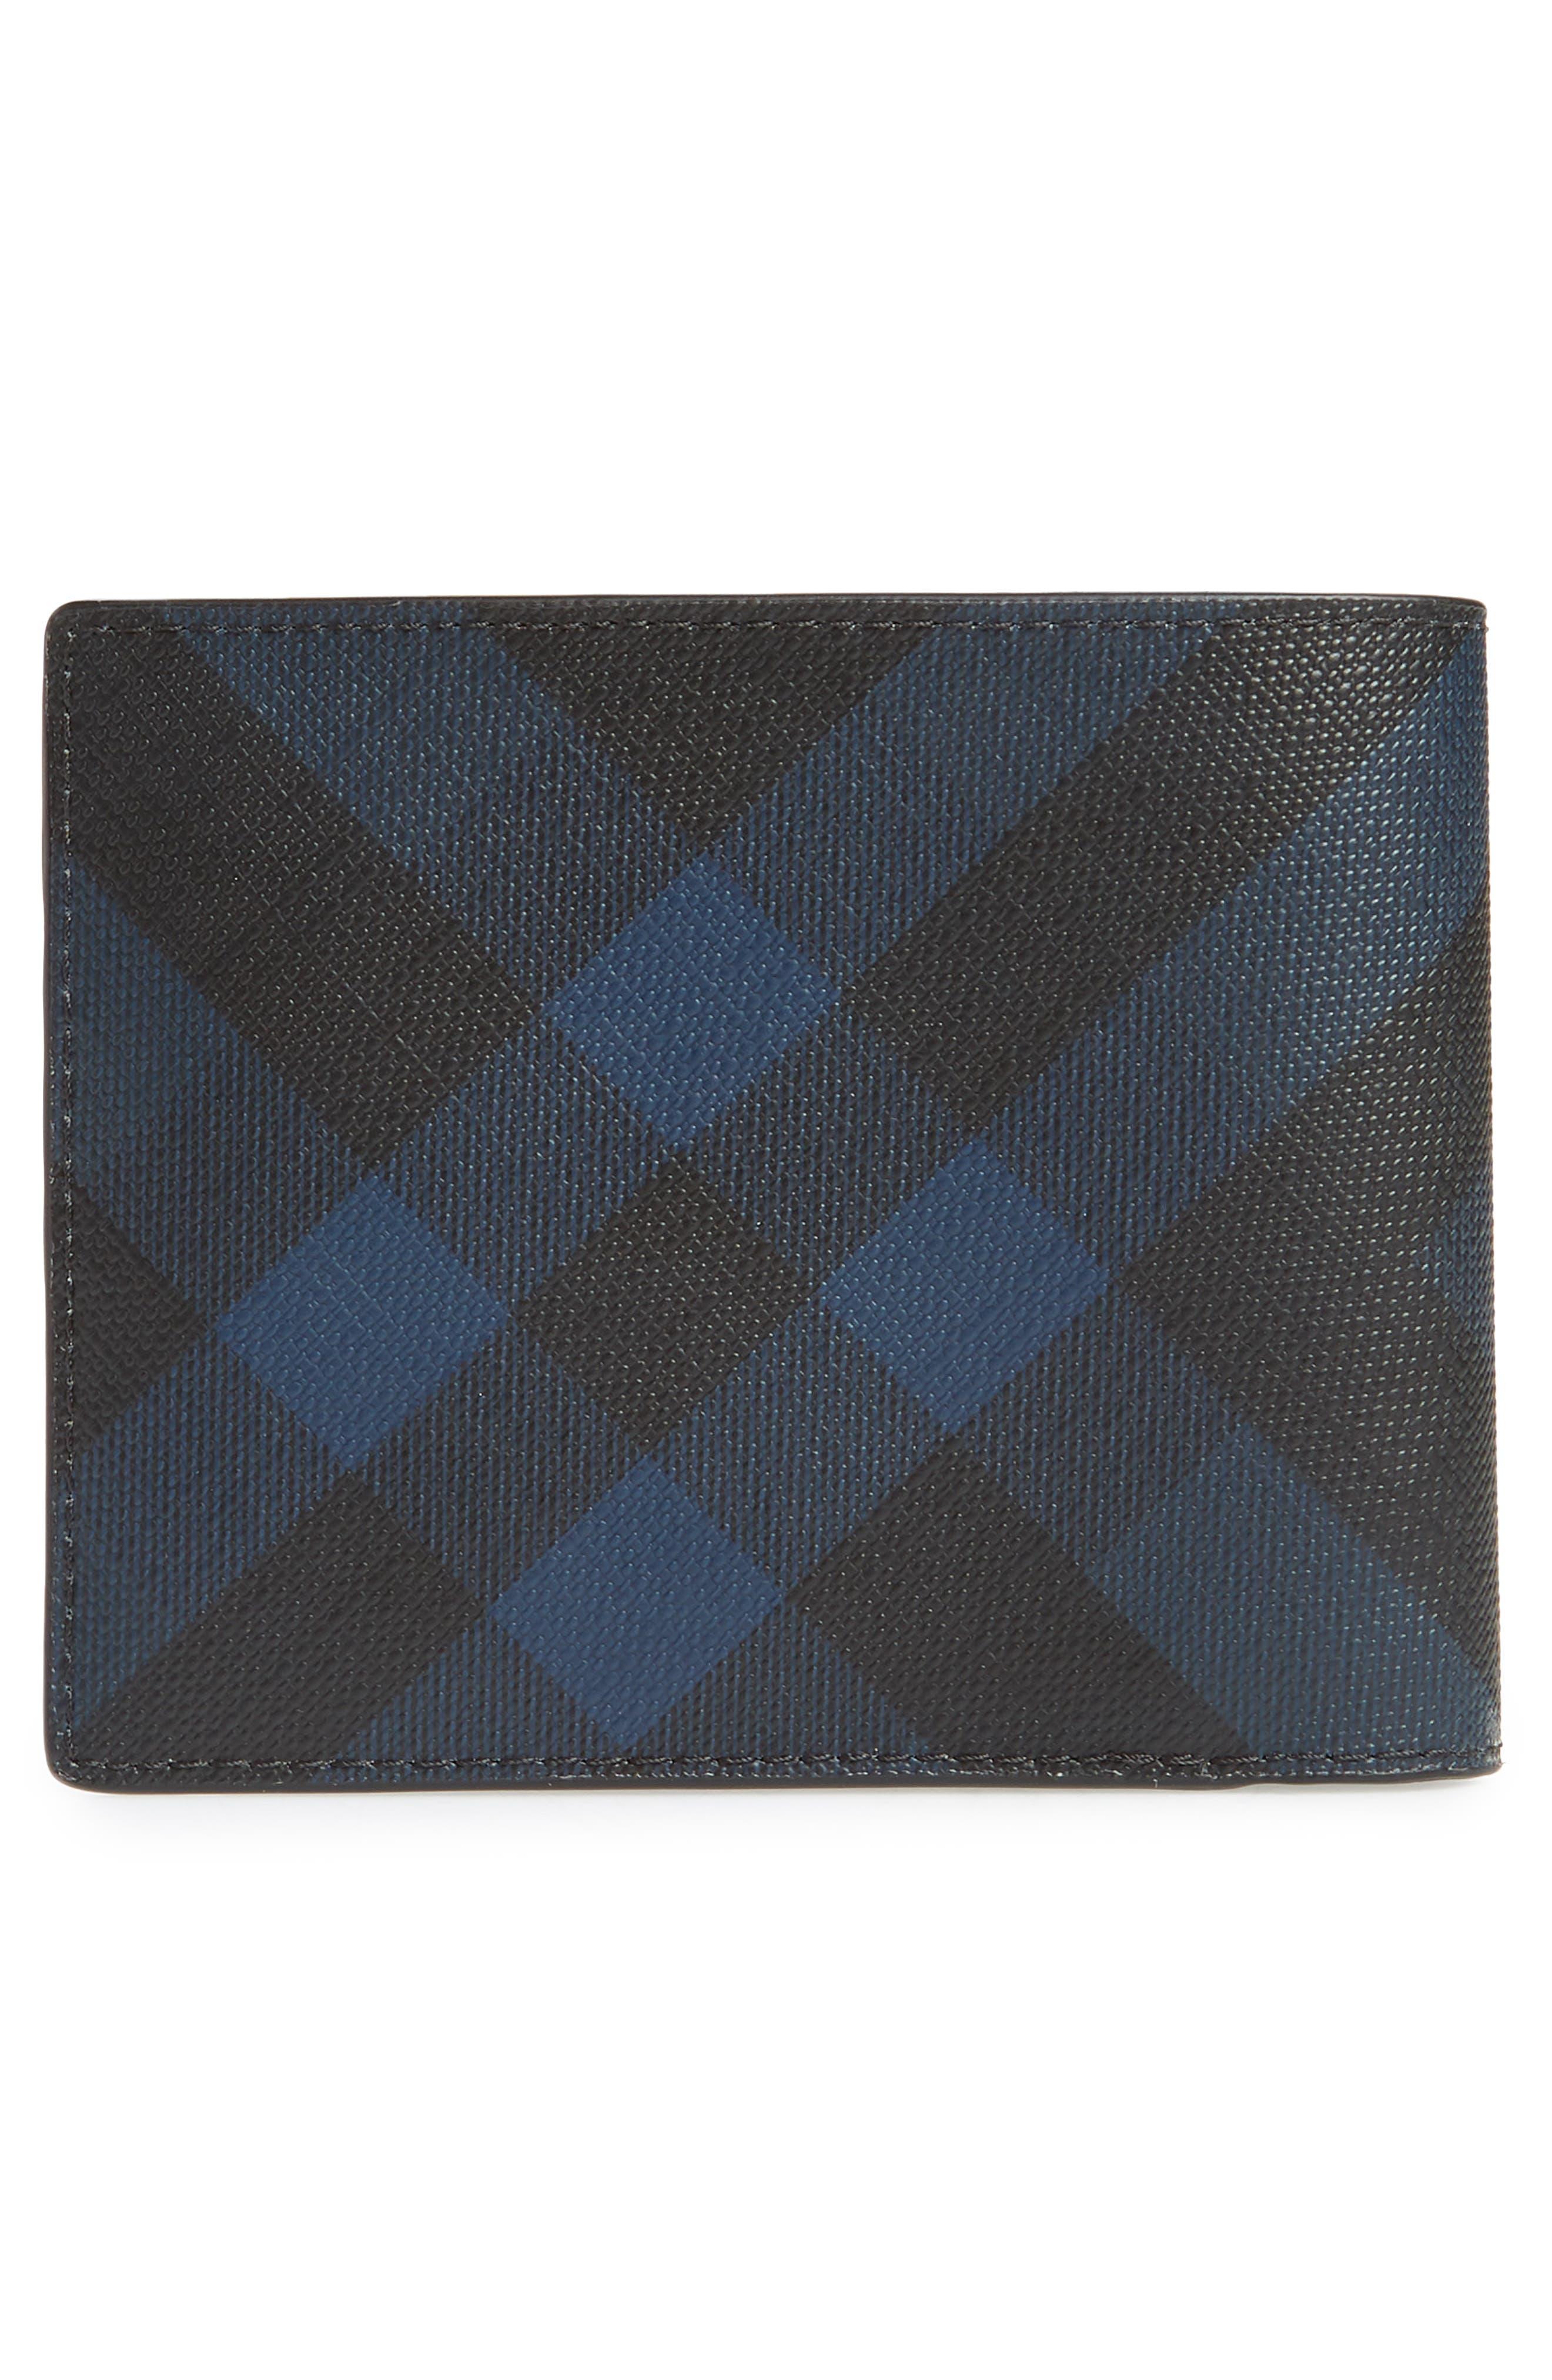 Ronan Check Billfold Wallet,                             Alternate thumbnail 3, color,                             Navy/ Black